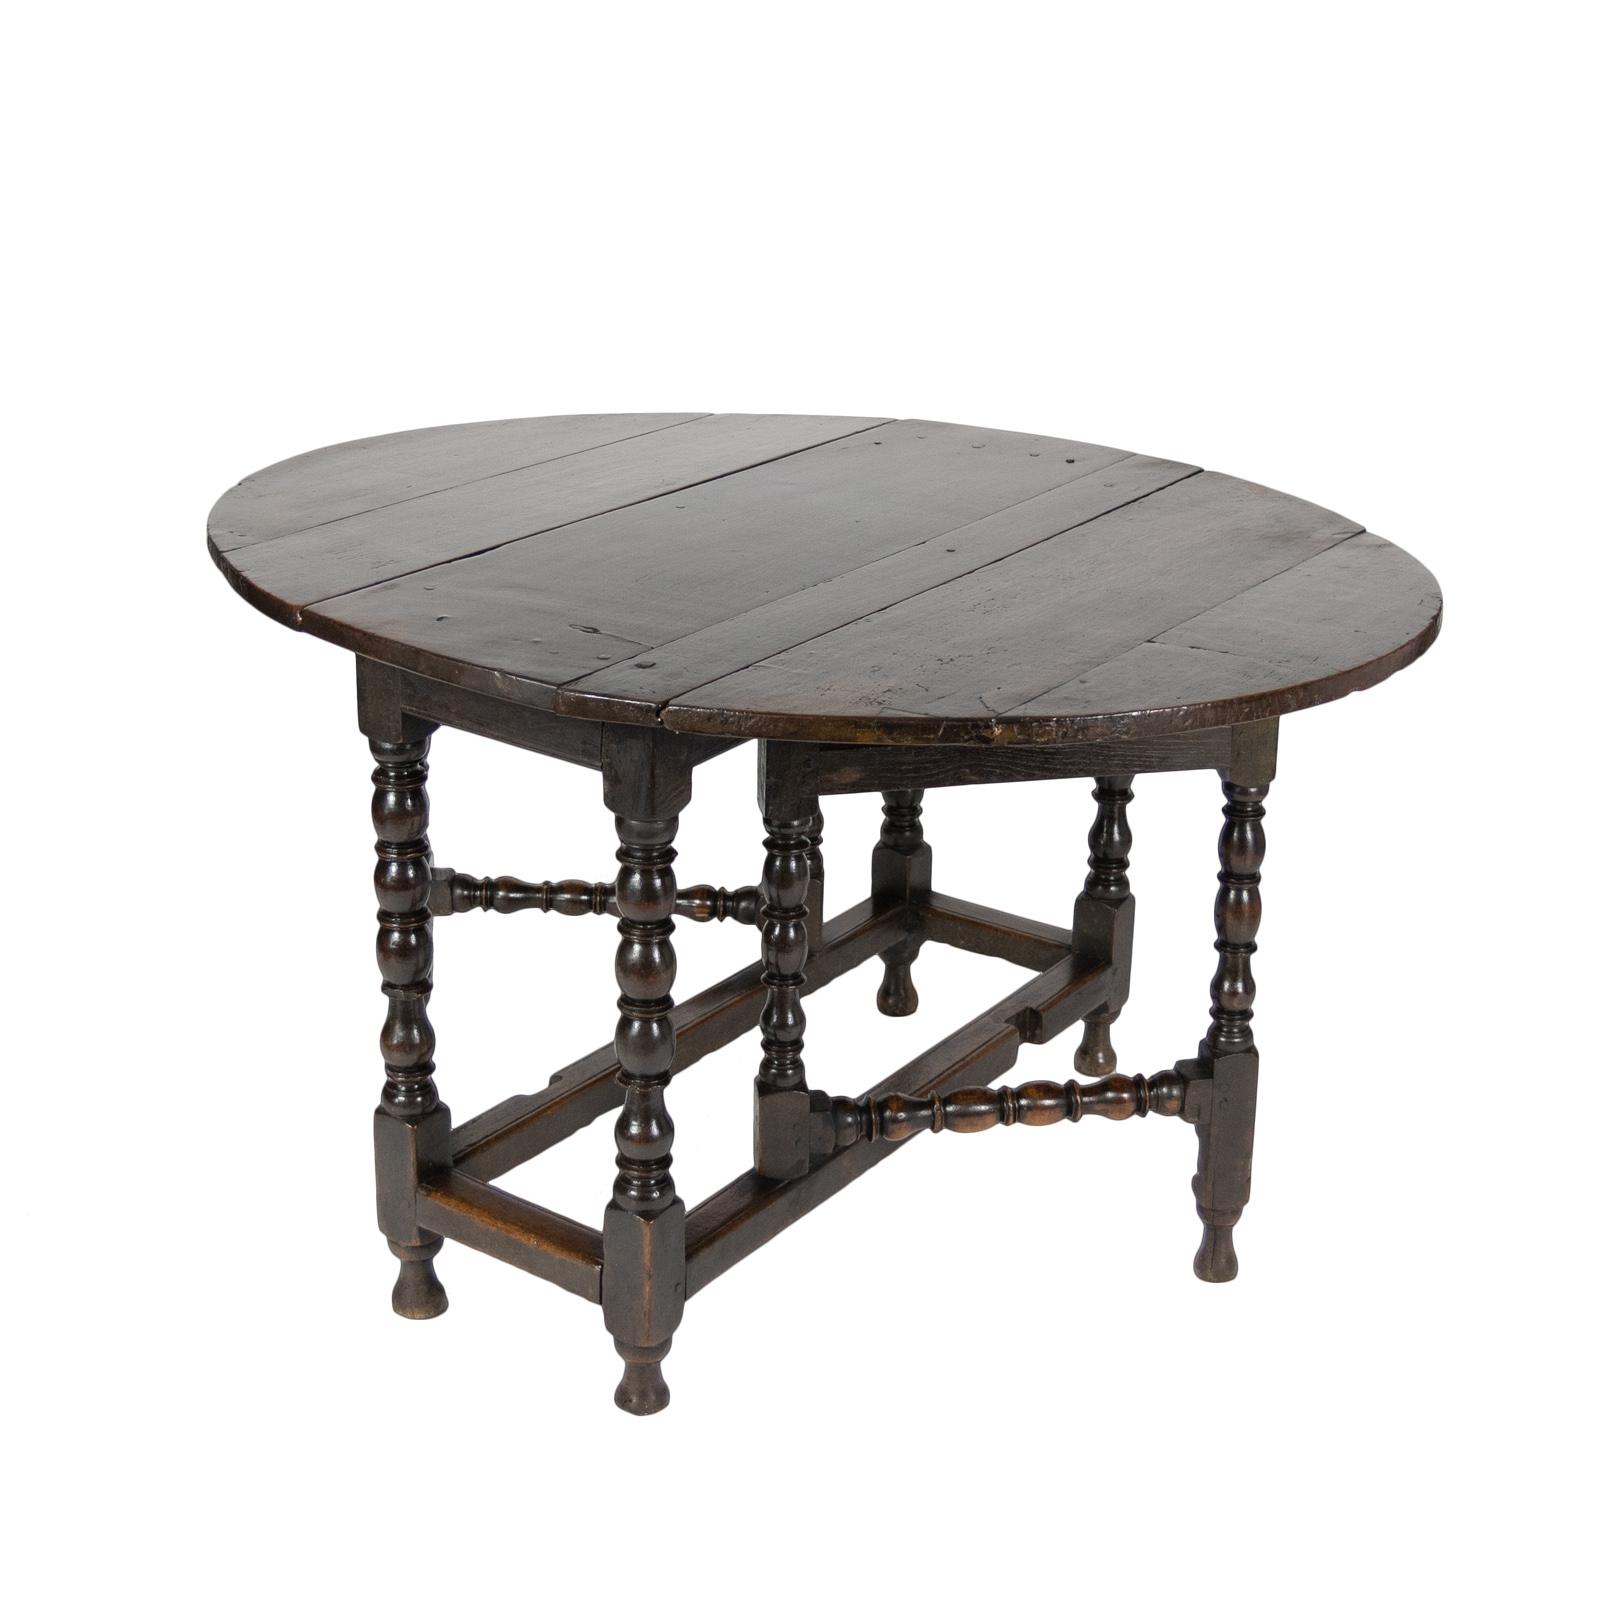 Handsome English Oak Gateleg Table With Bobbin Turned Legs, Wonderfully  Rich Patination, Circa 1800